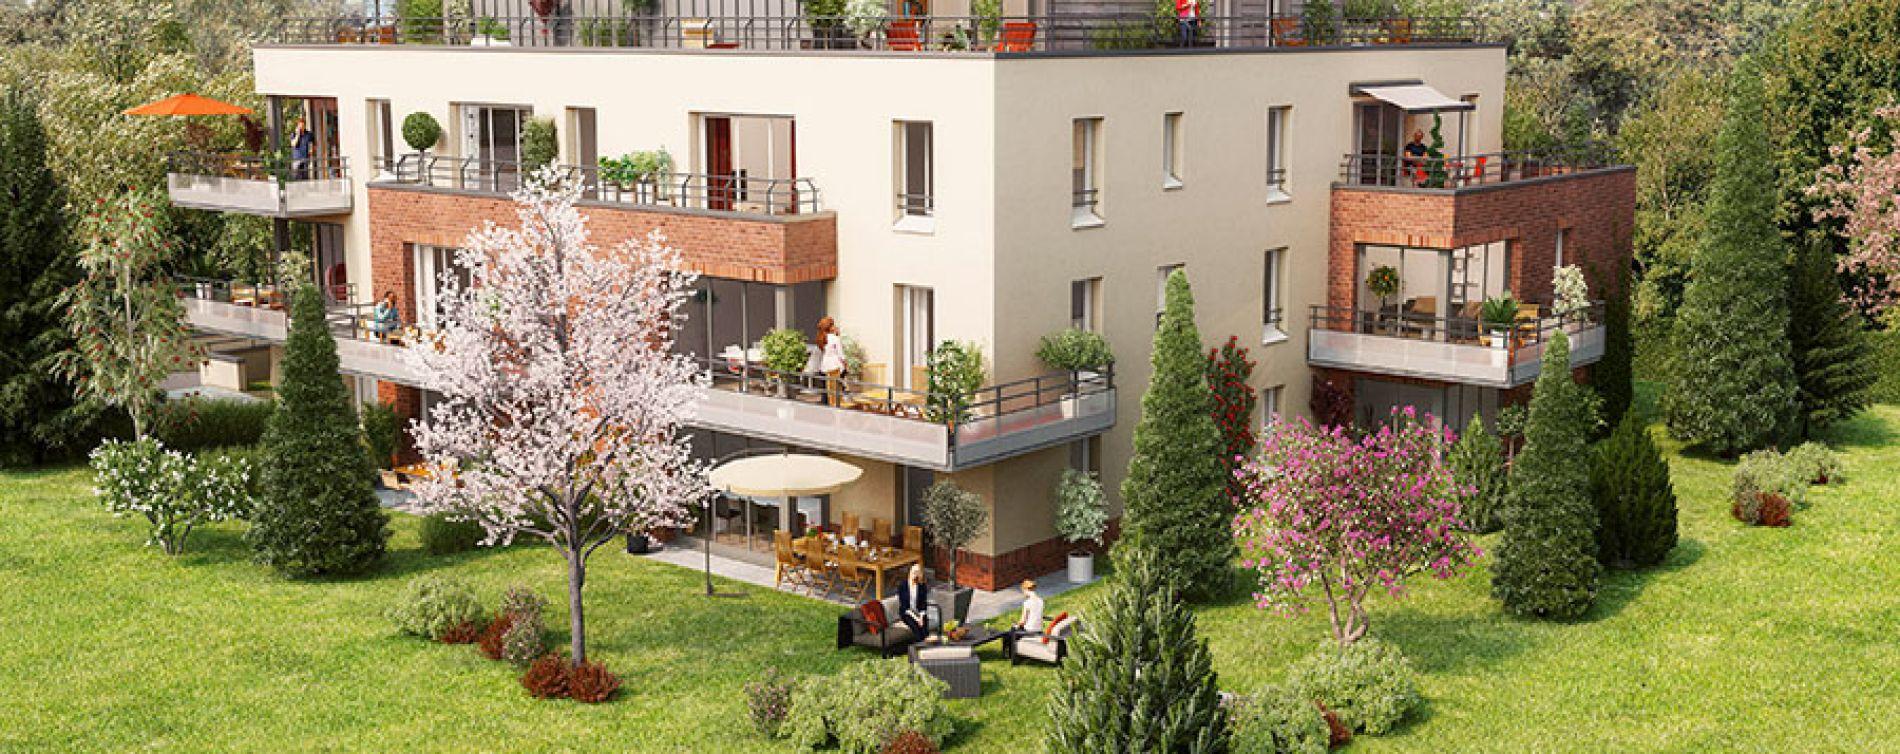 Résidence Aramis à Amiens